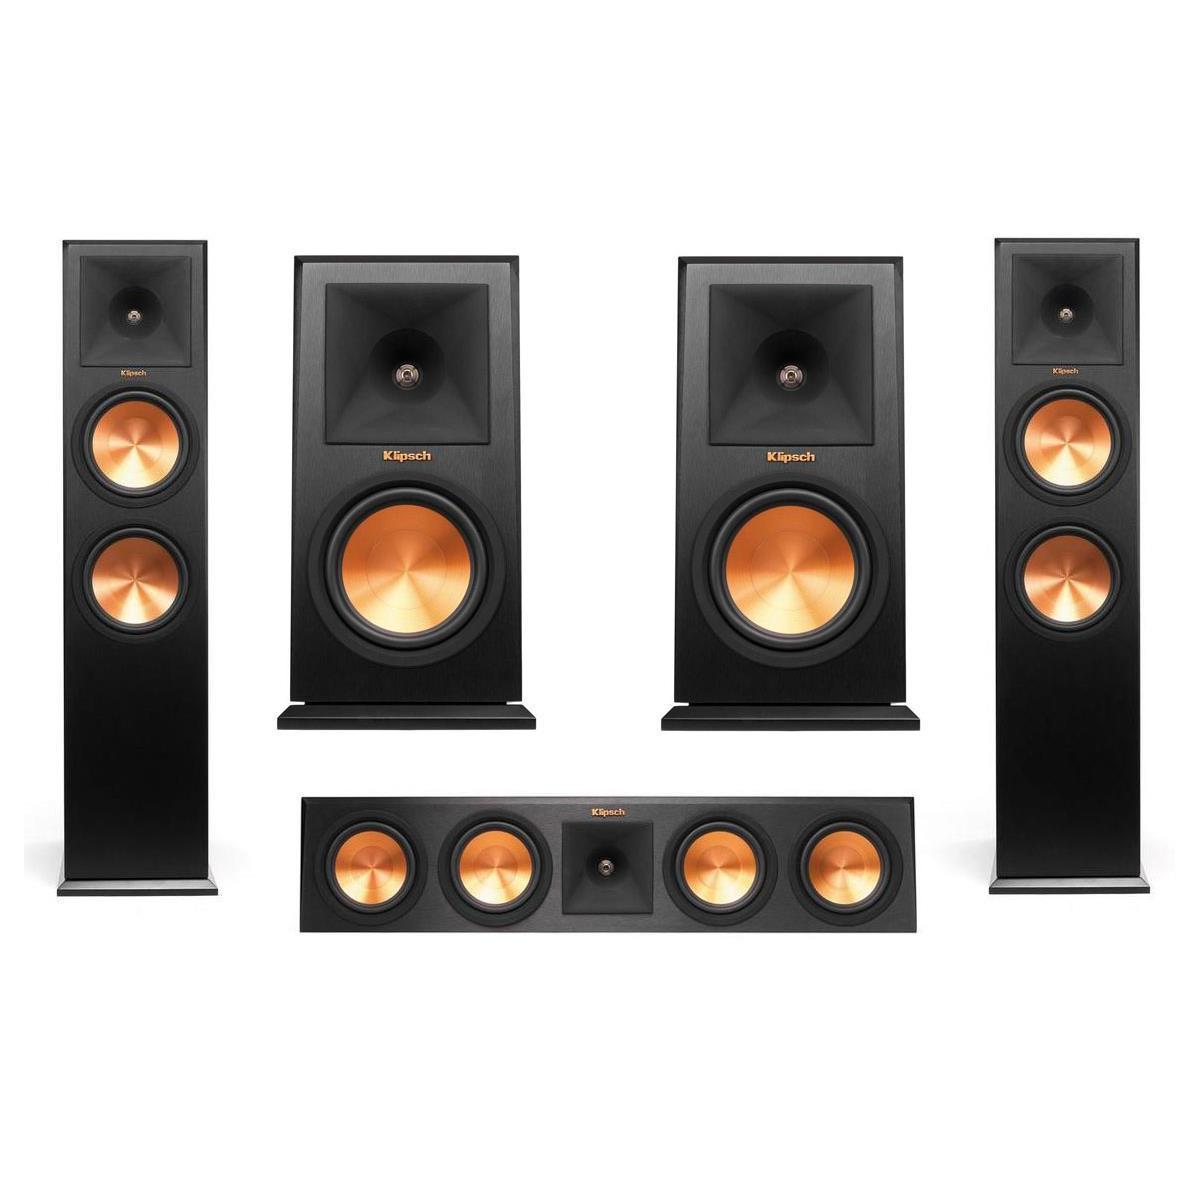 klipsch 280fa. klipsch 5 to 7 speaker bundles: rp-280f $1400, rf-7 ii w/ rc-64 center - slickdeals.net 280fa e